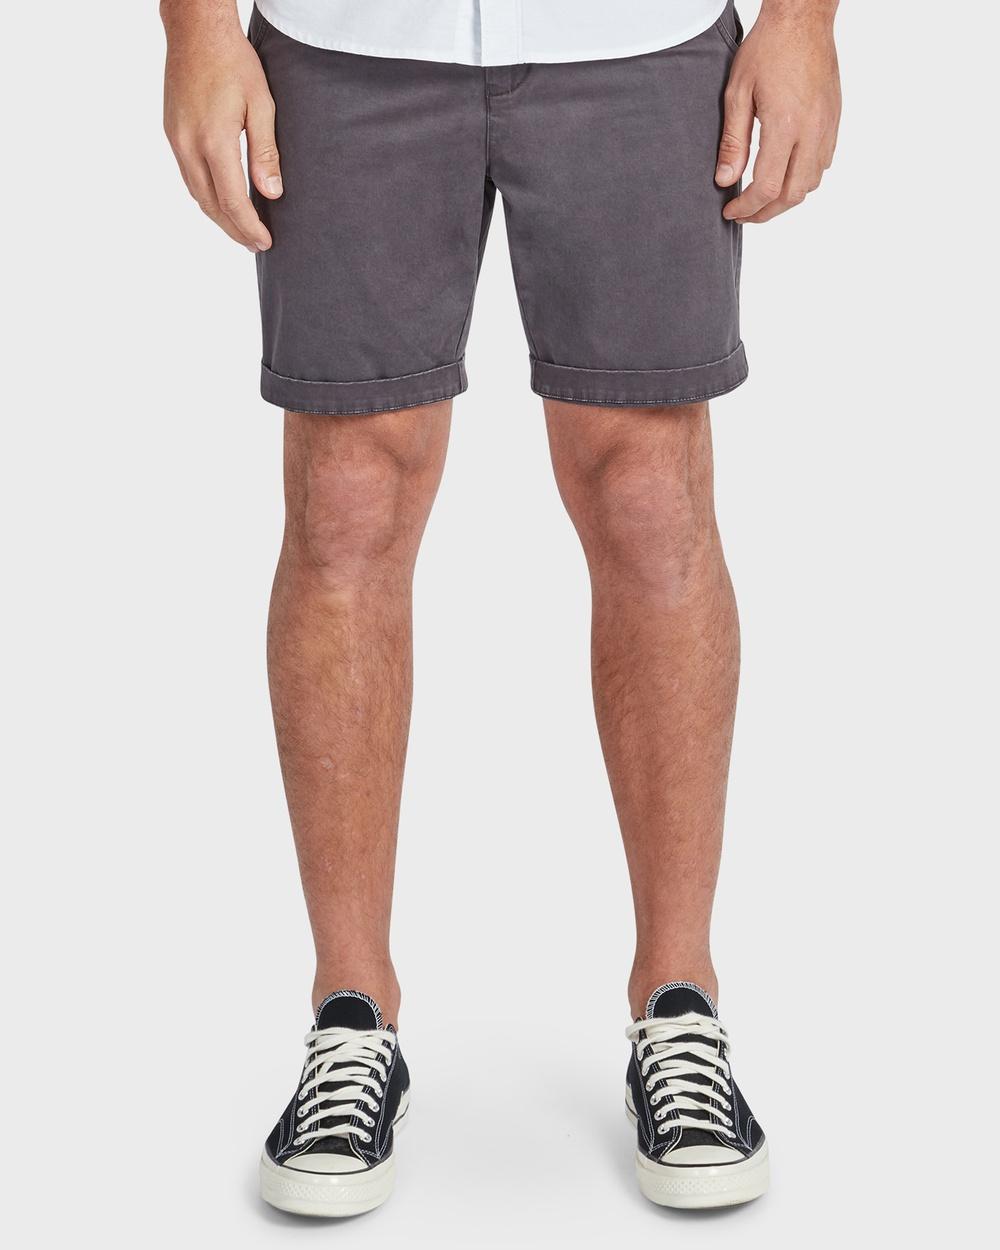 Academy Brand Cooper Chino Short Shorts Grey